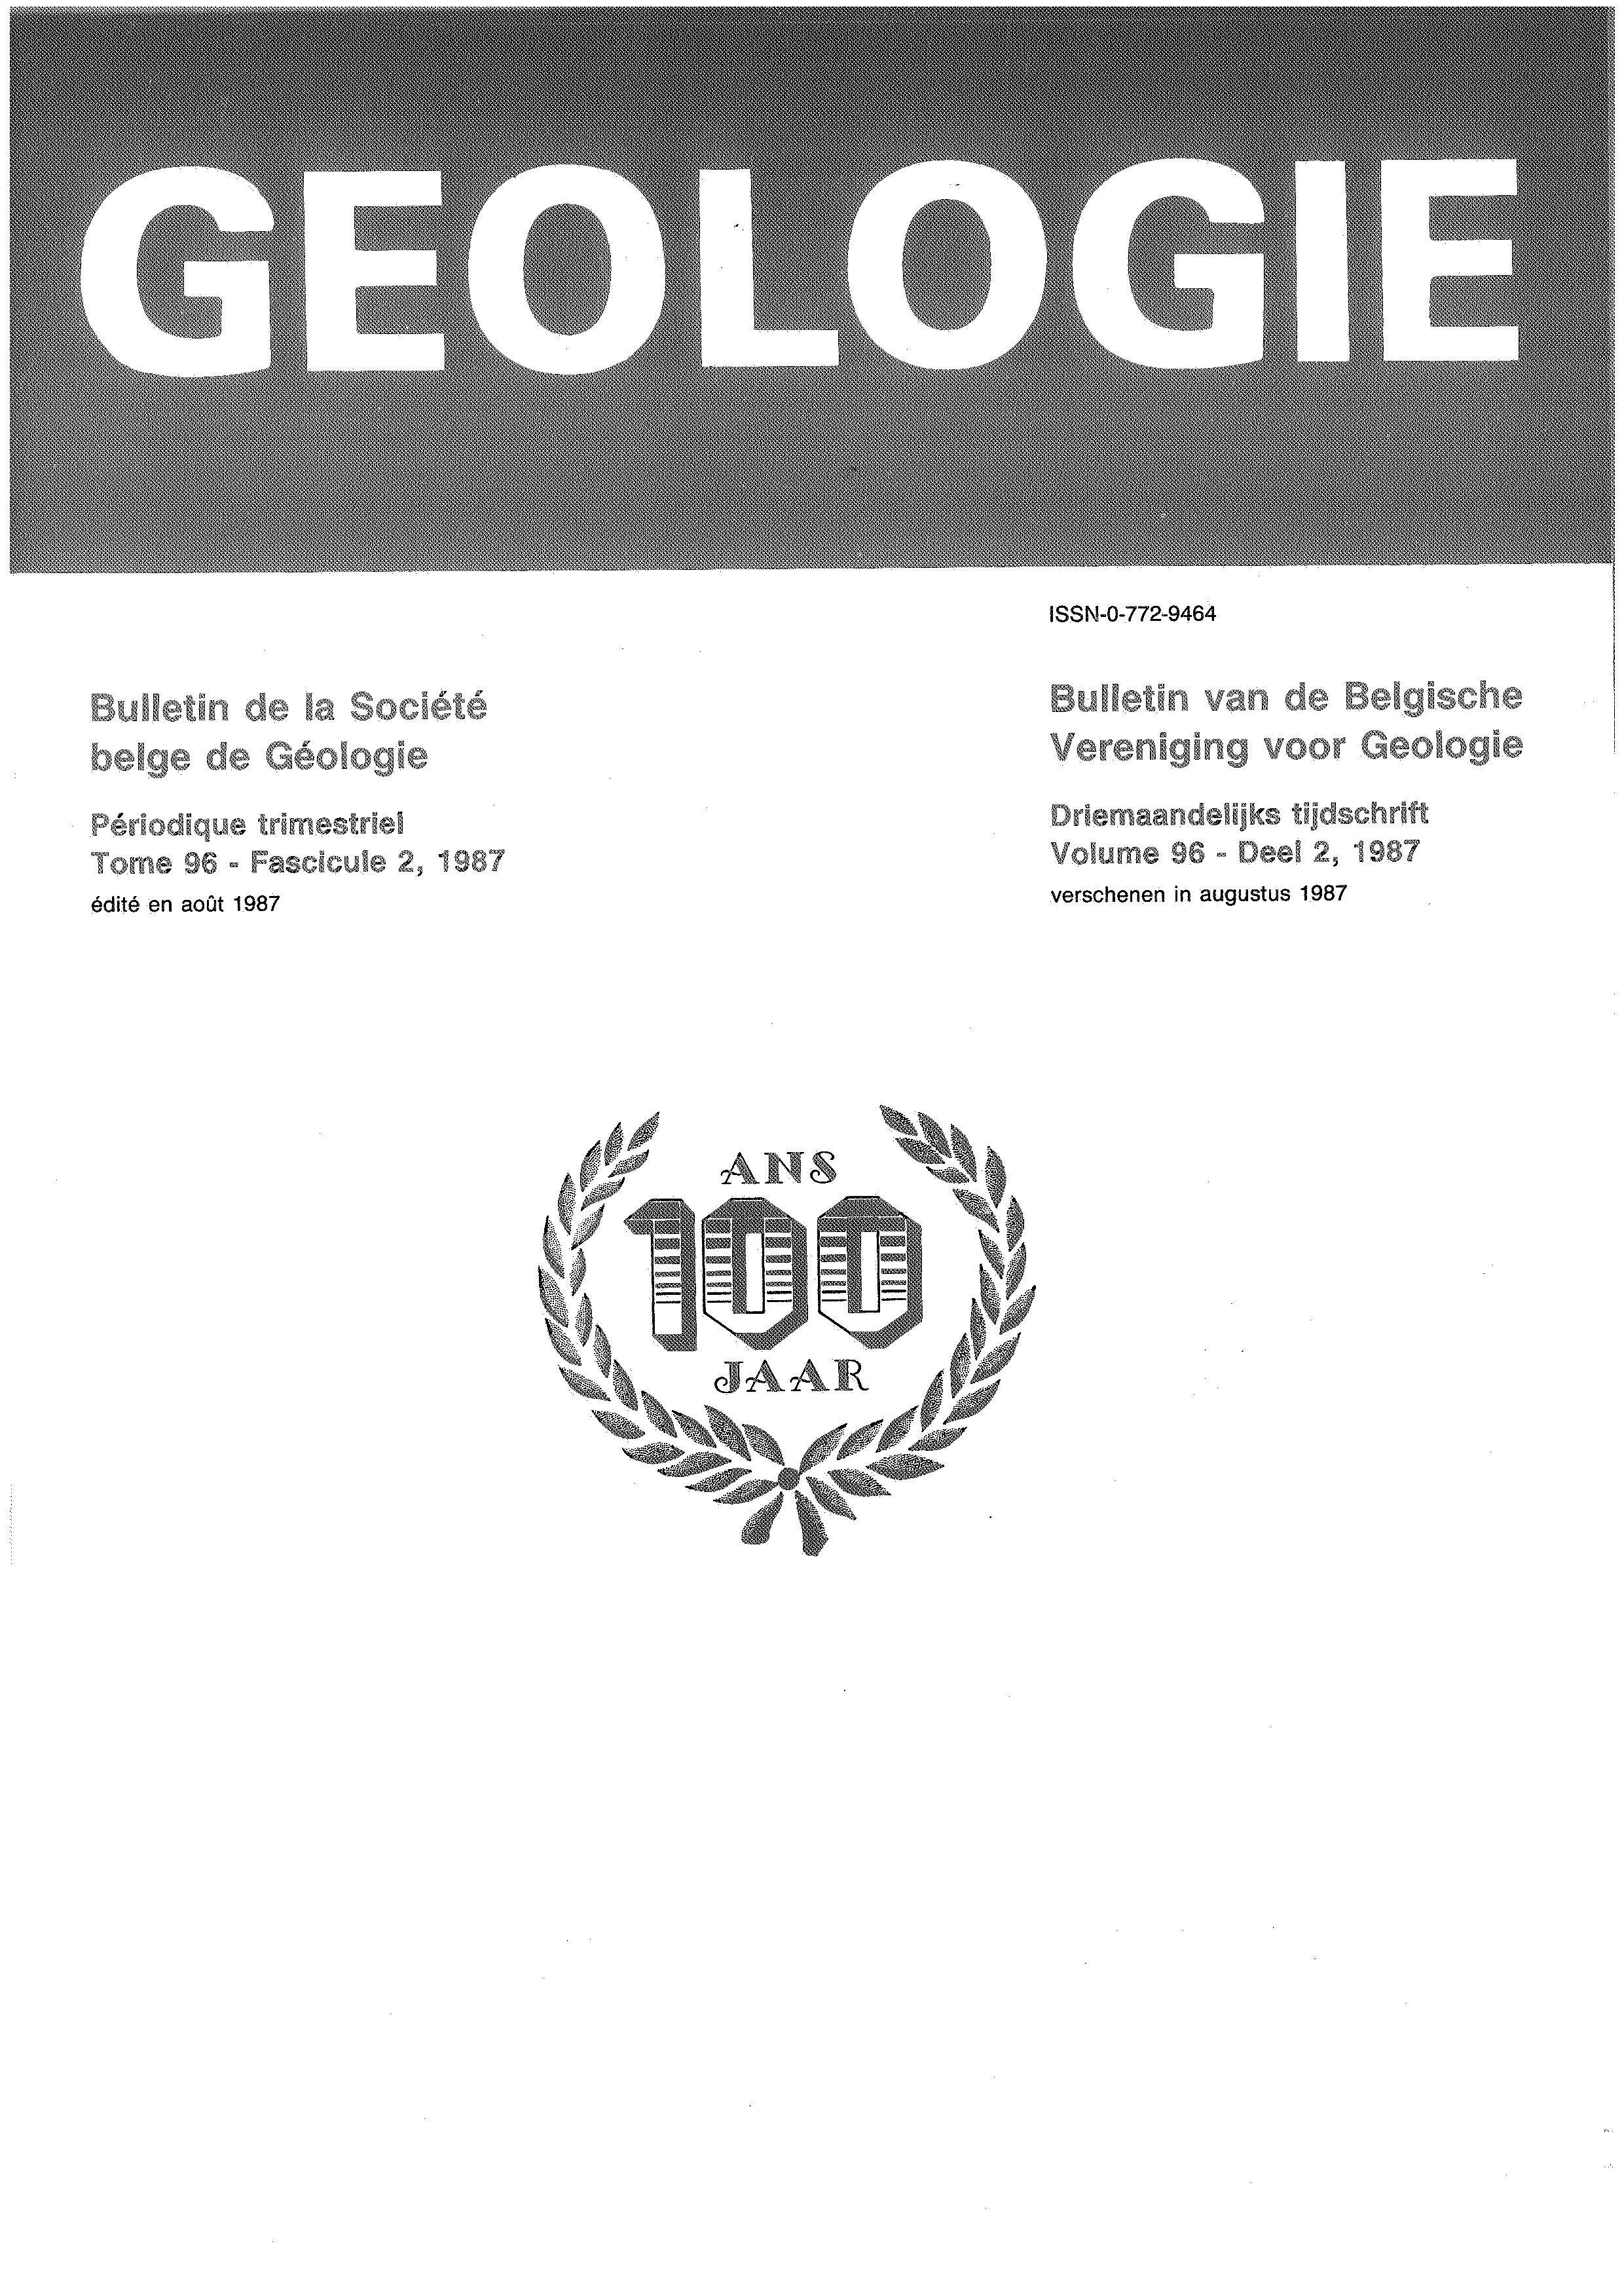 BSBG cover 2.jpg